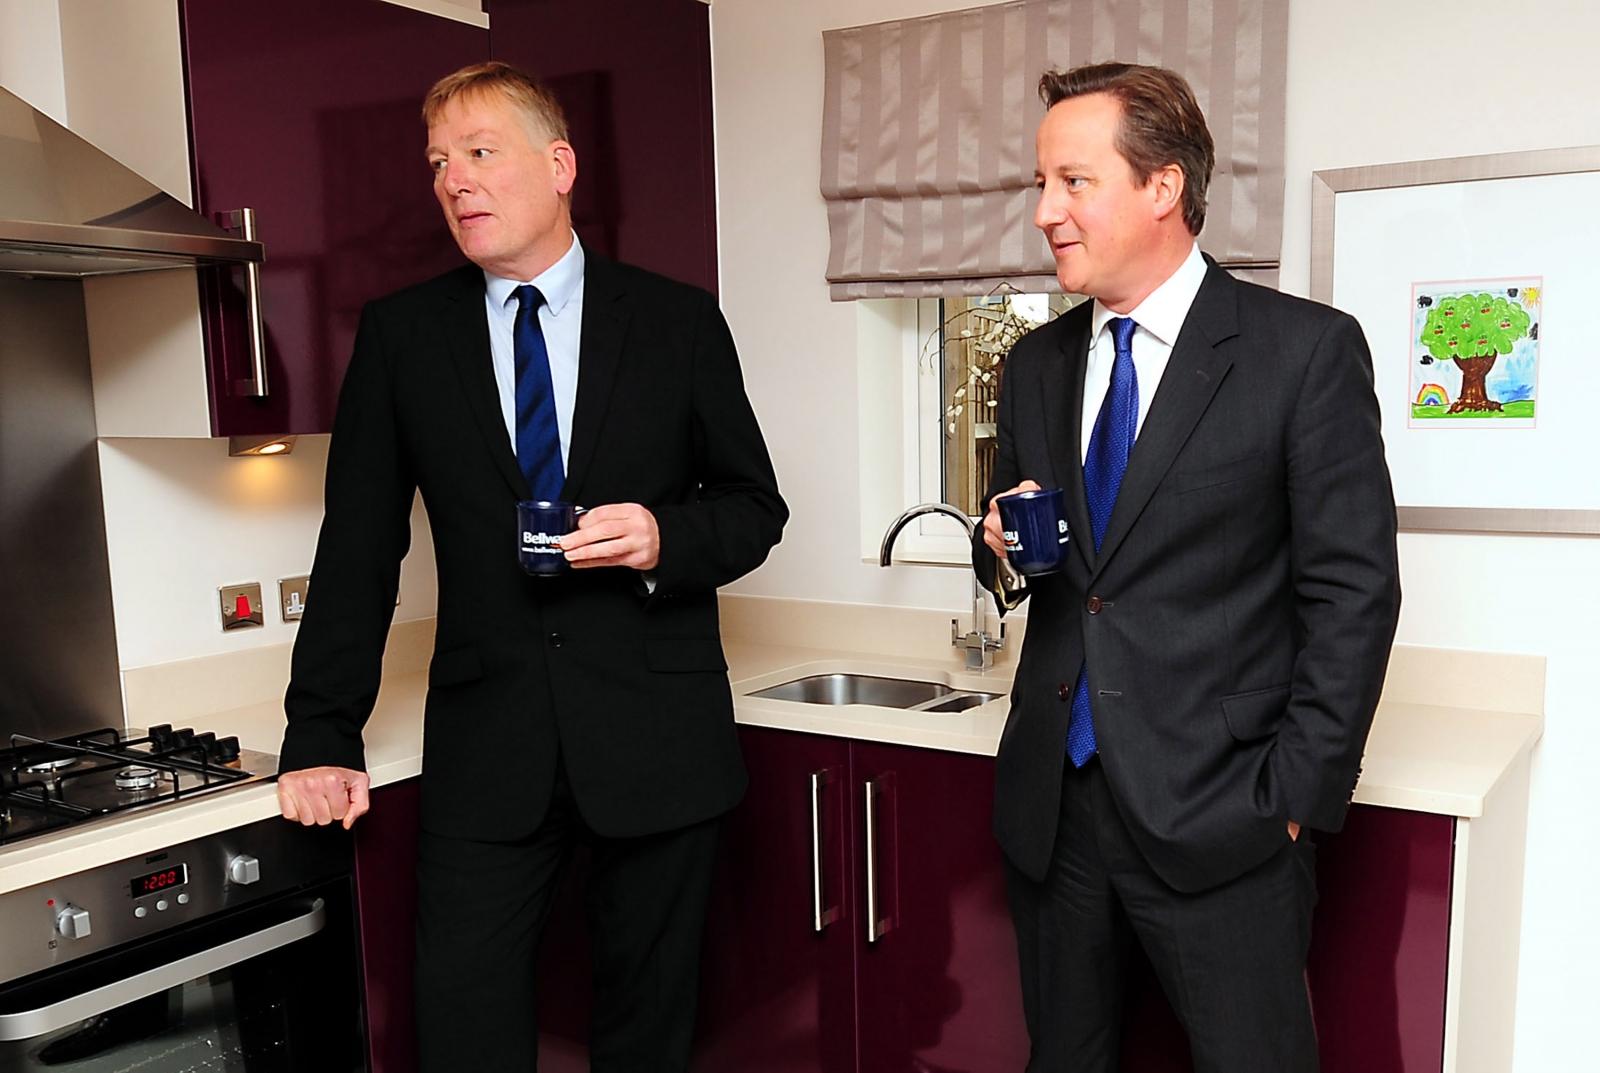 Hopkins and Cameron